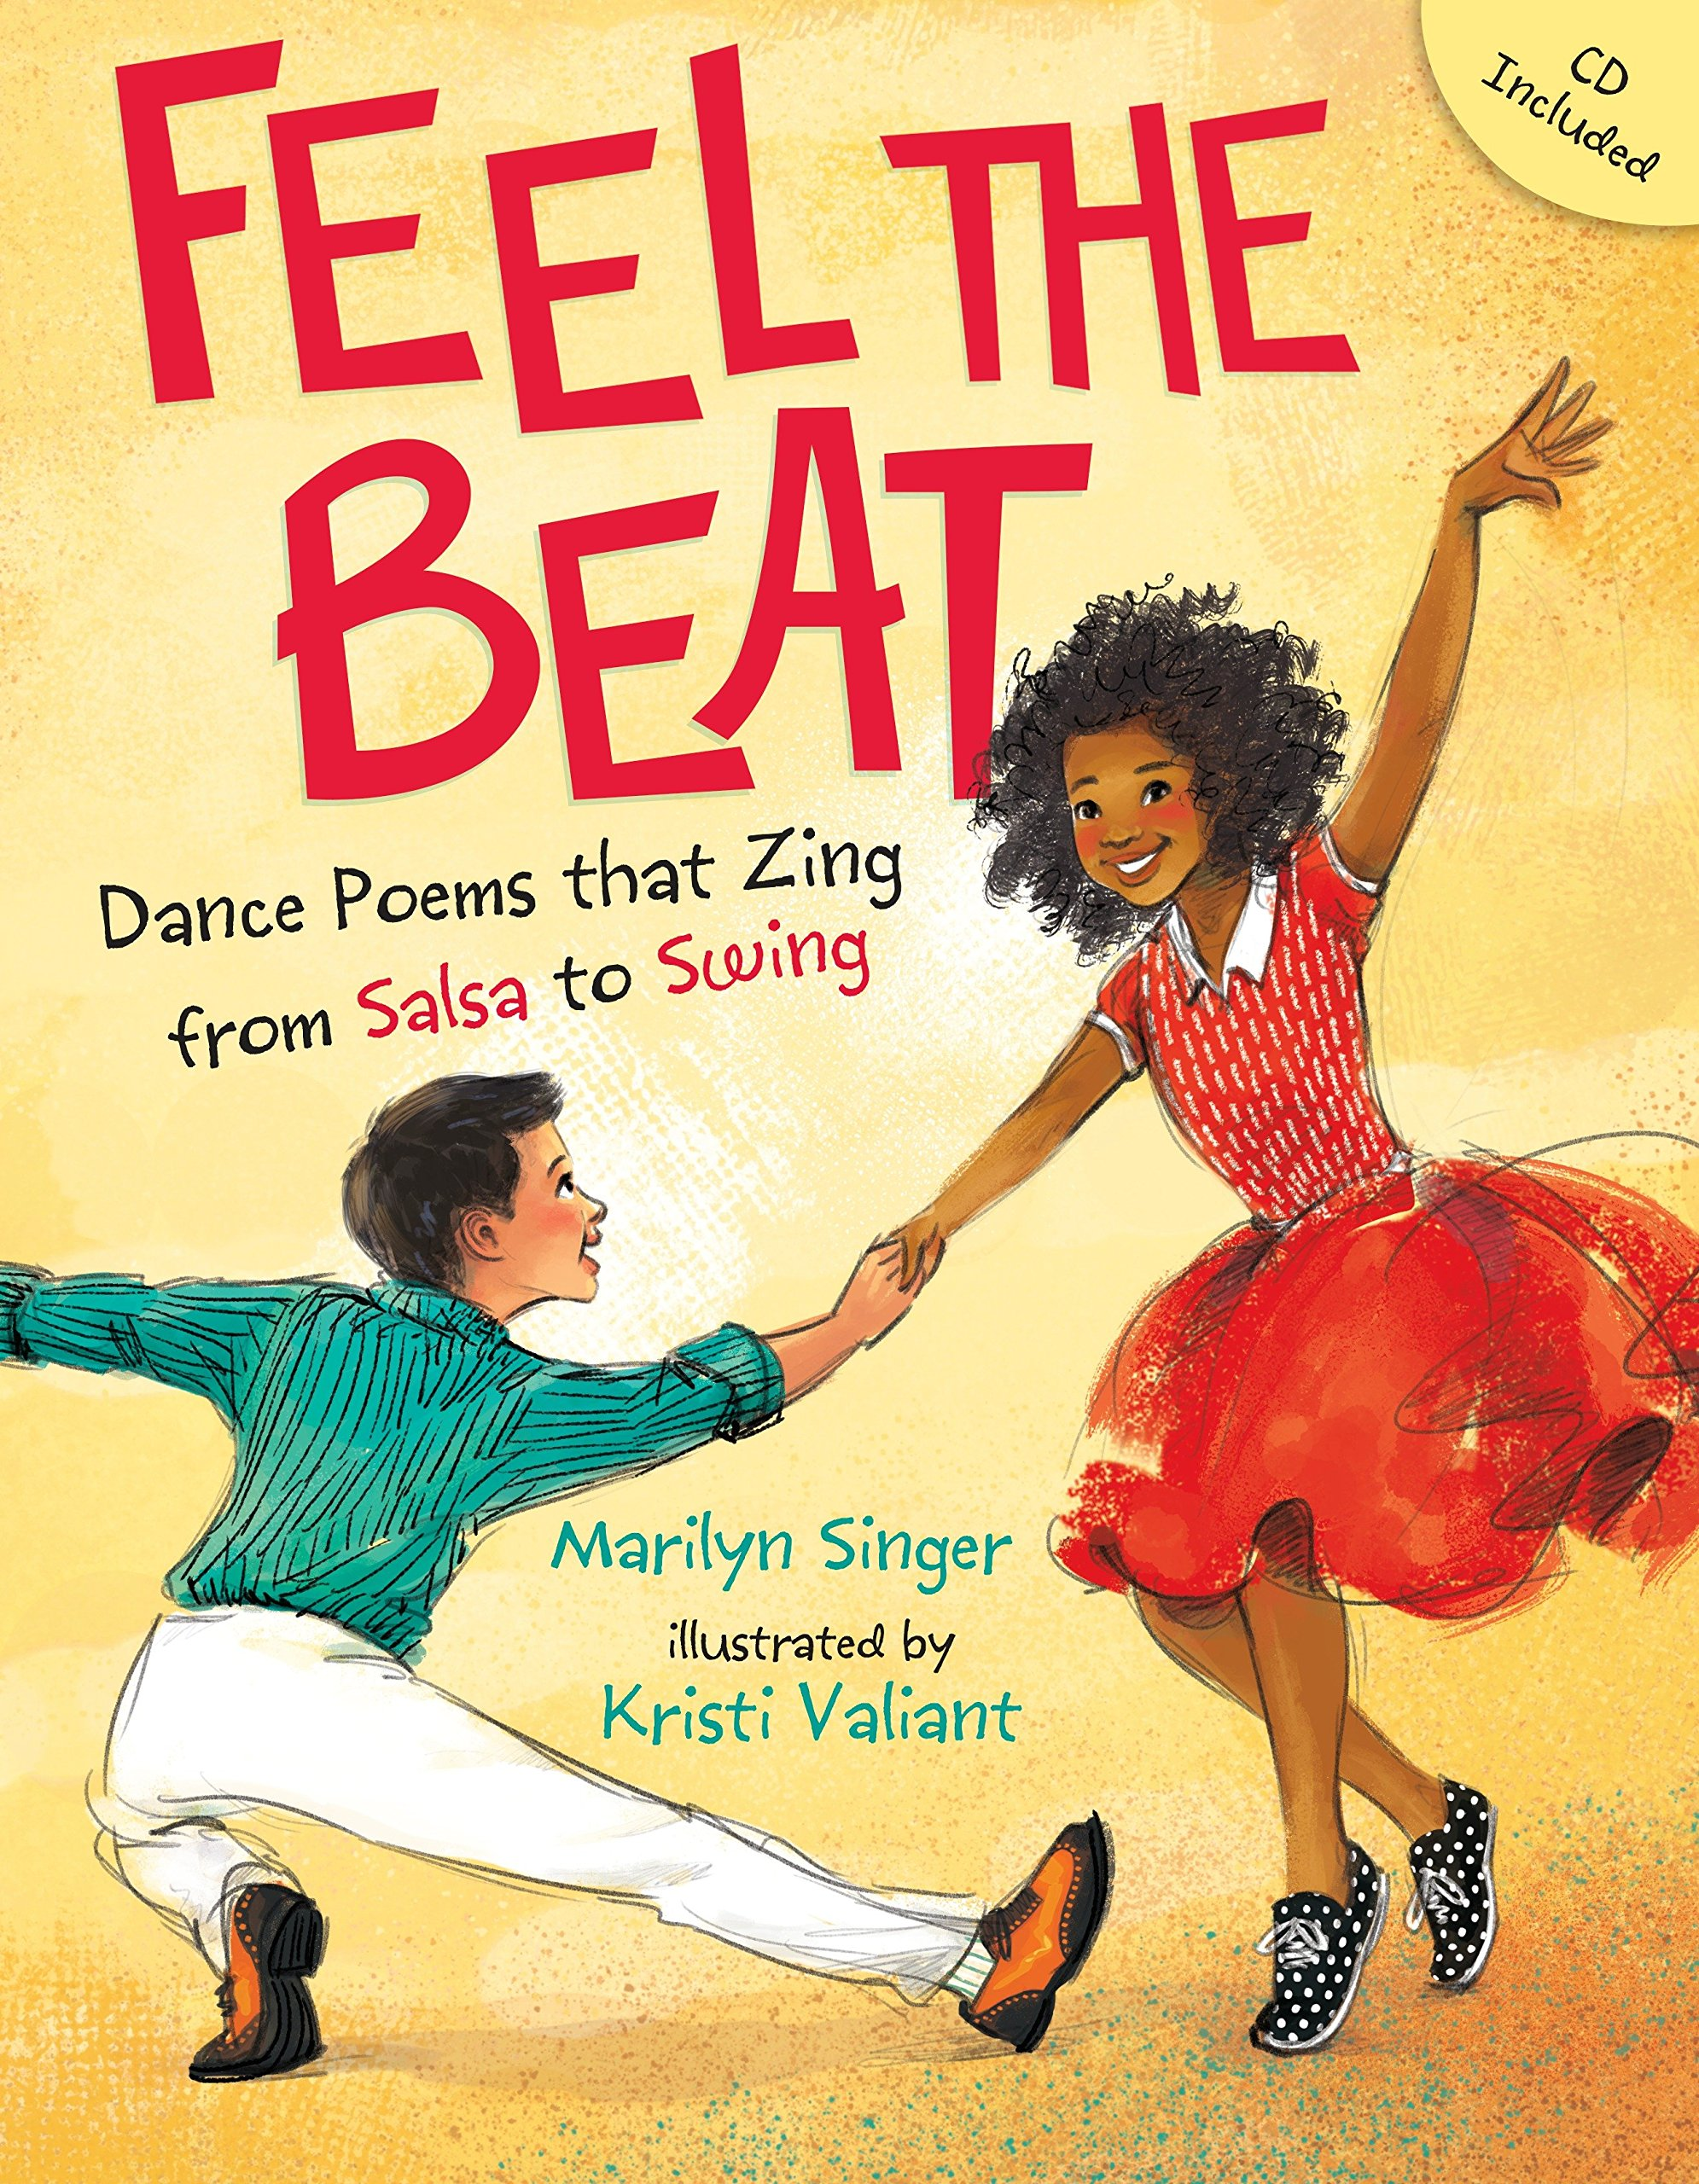 Feel Beat Dance Poems Salsa product image